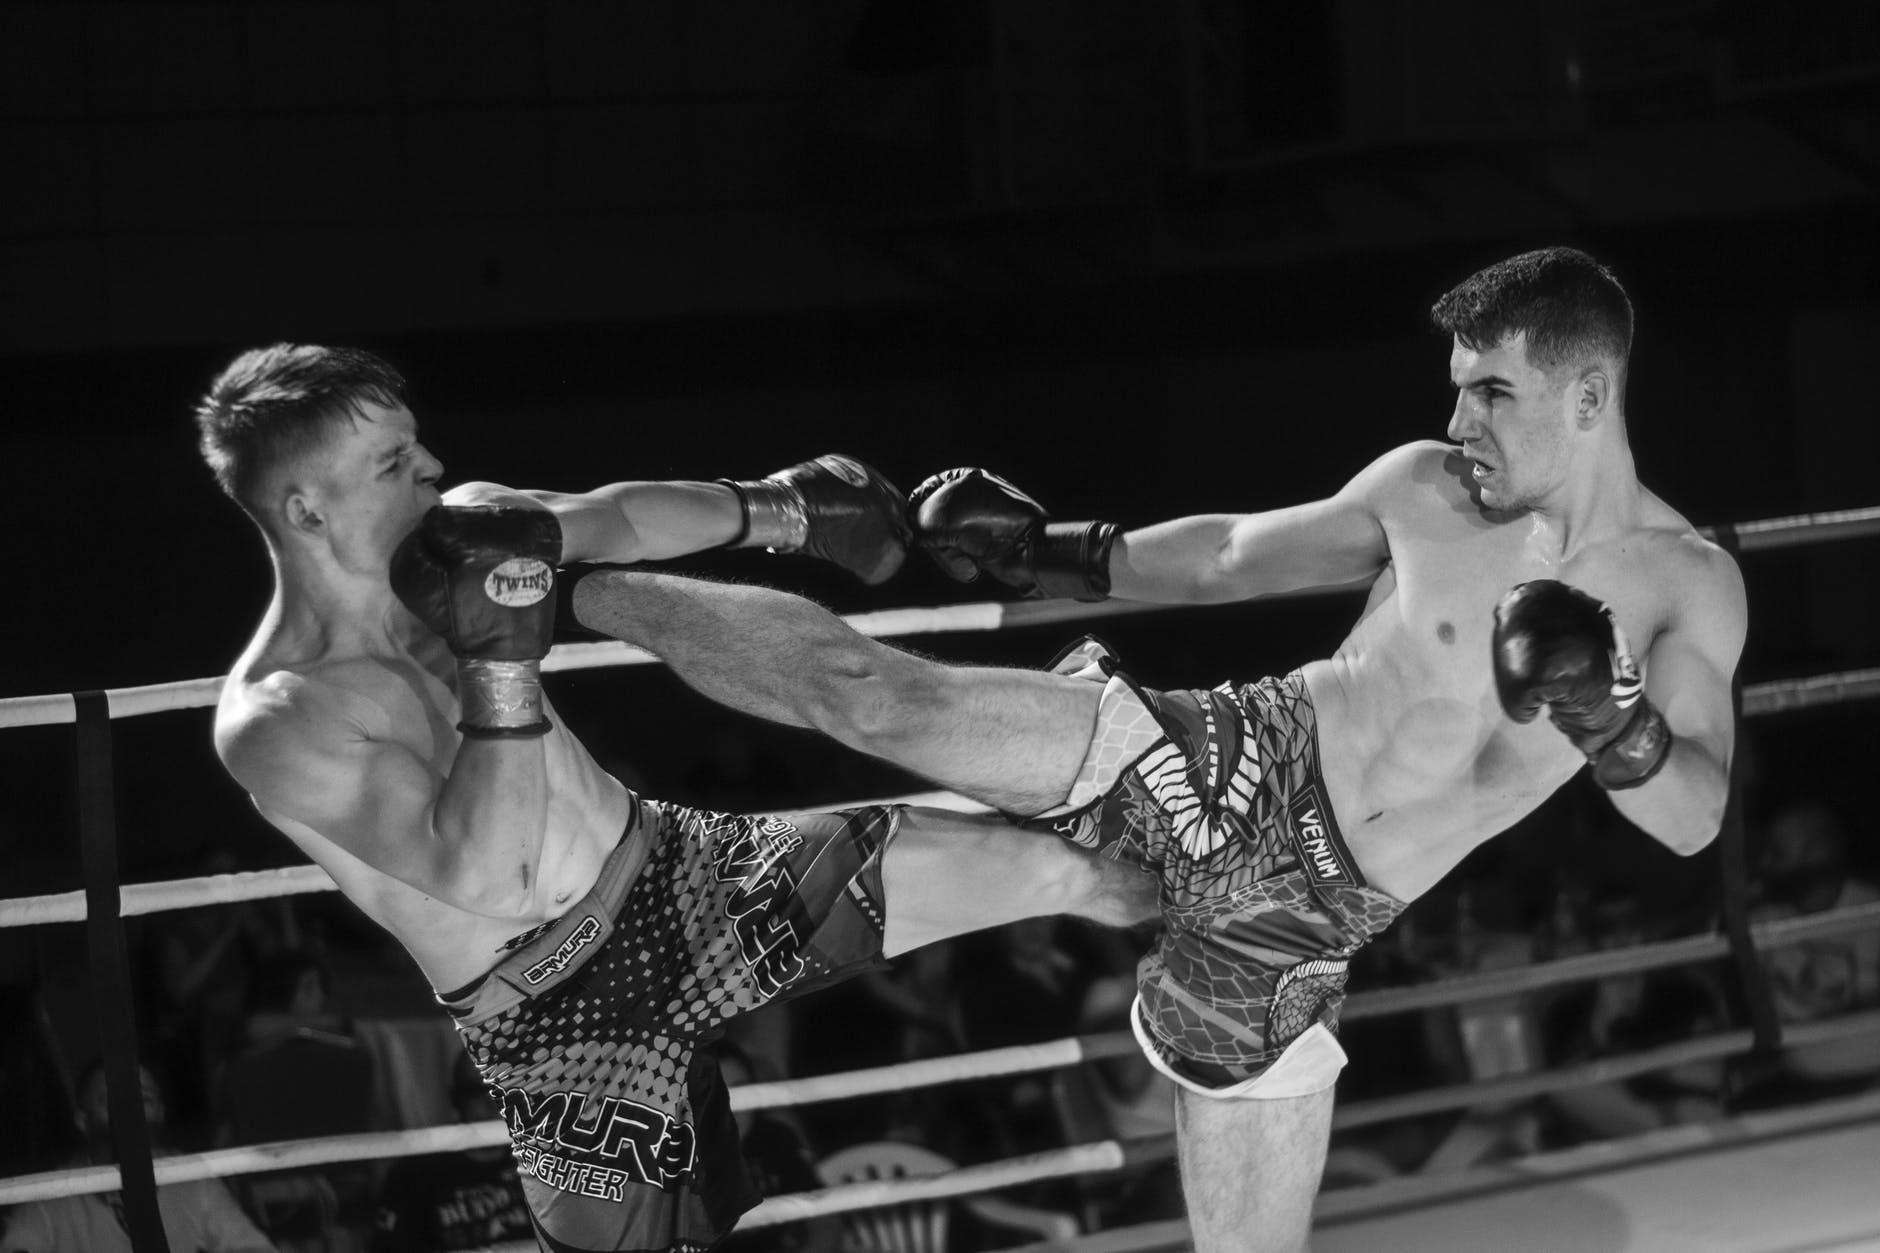 men fighting in the ring